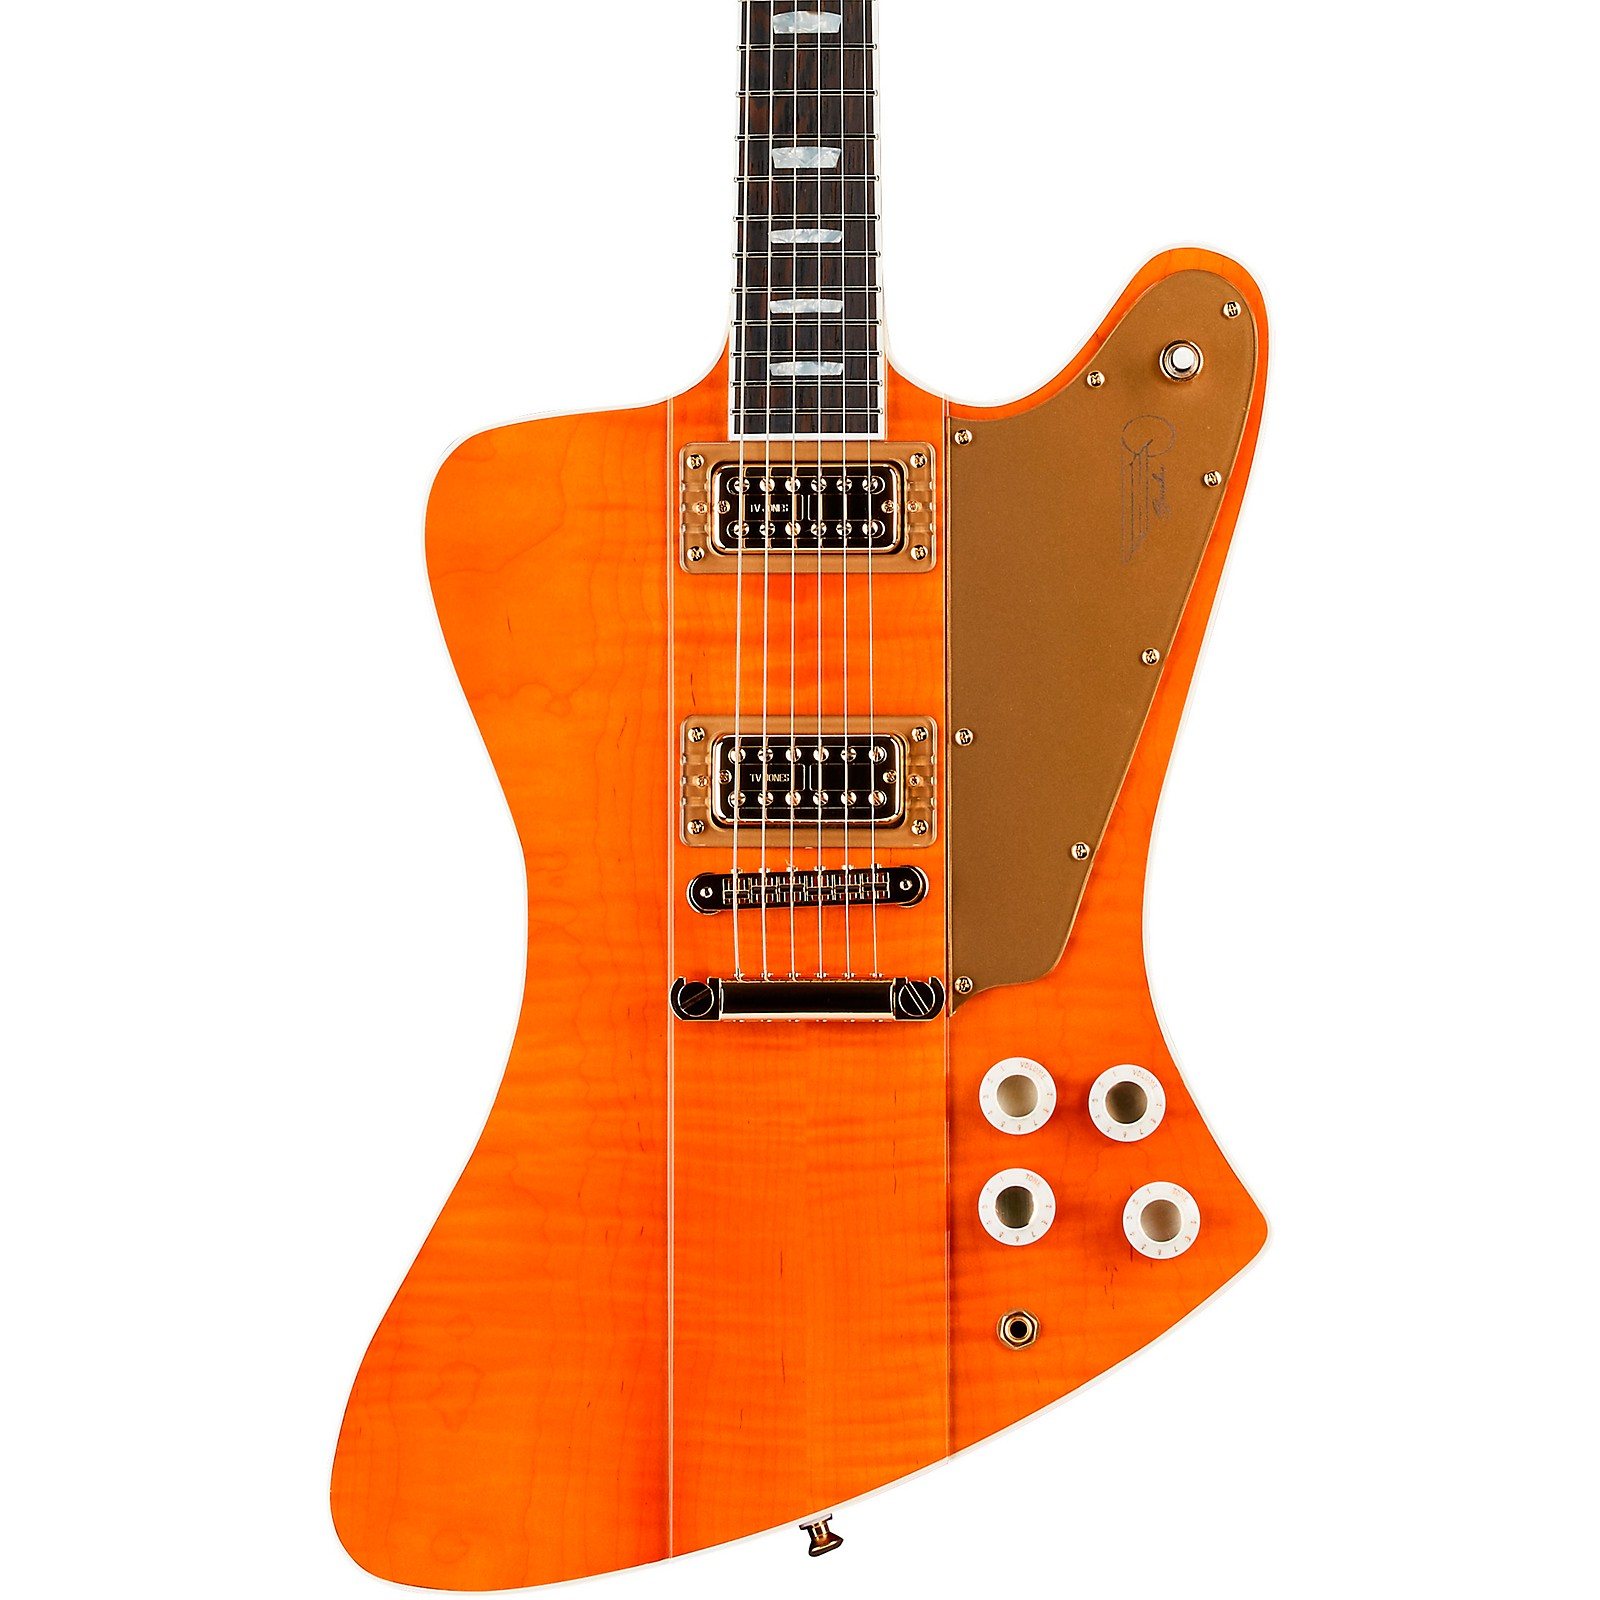 Kauer Guitars Banshee Deluxe Powertron Electric Guitar